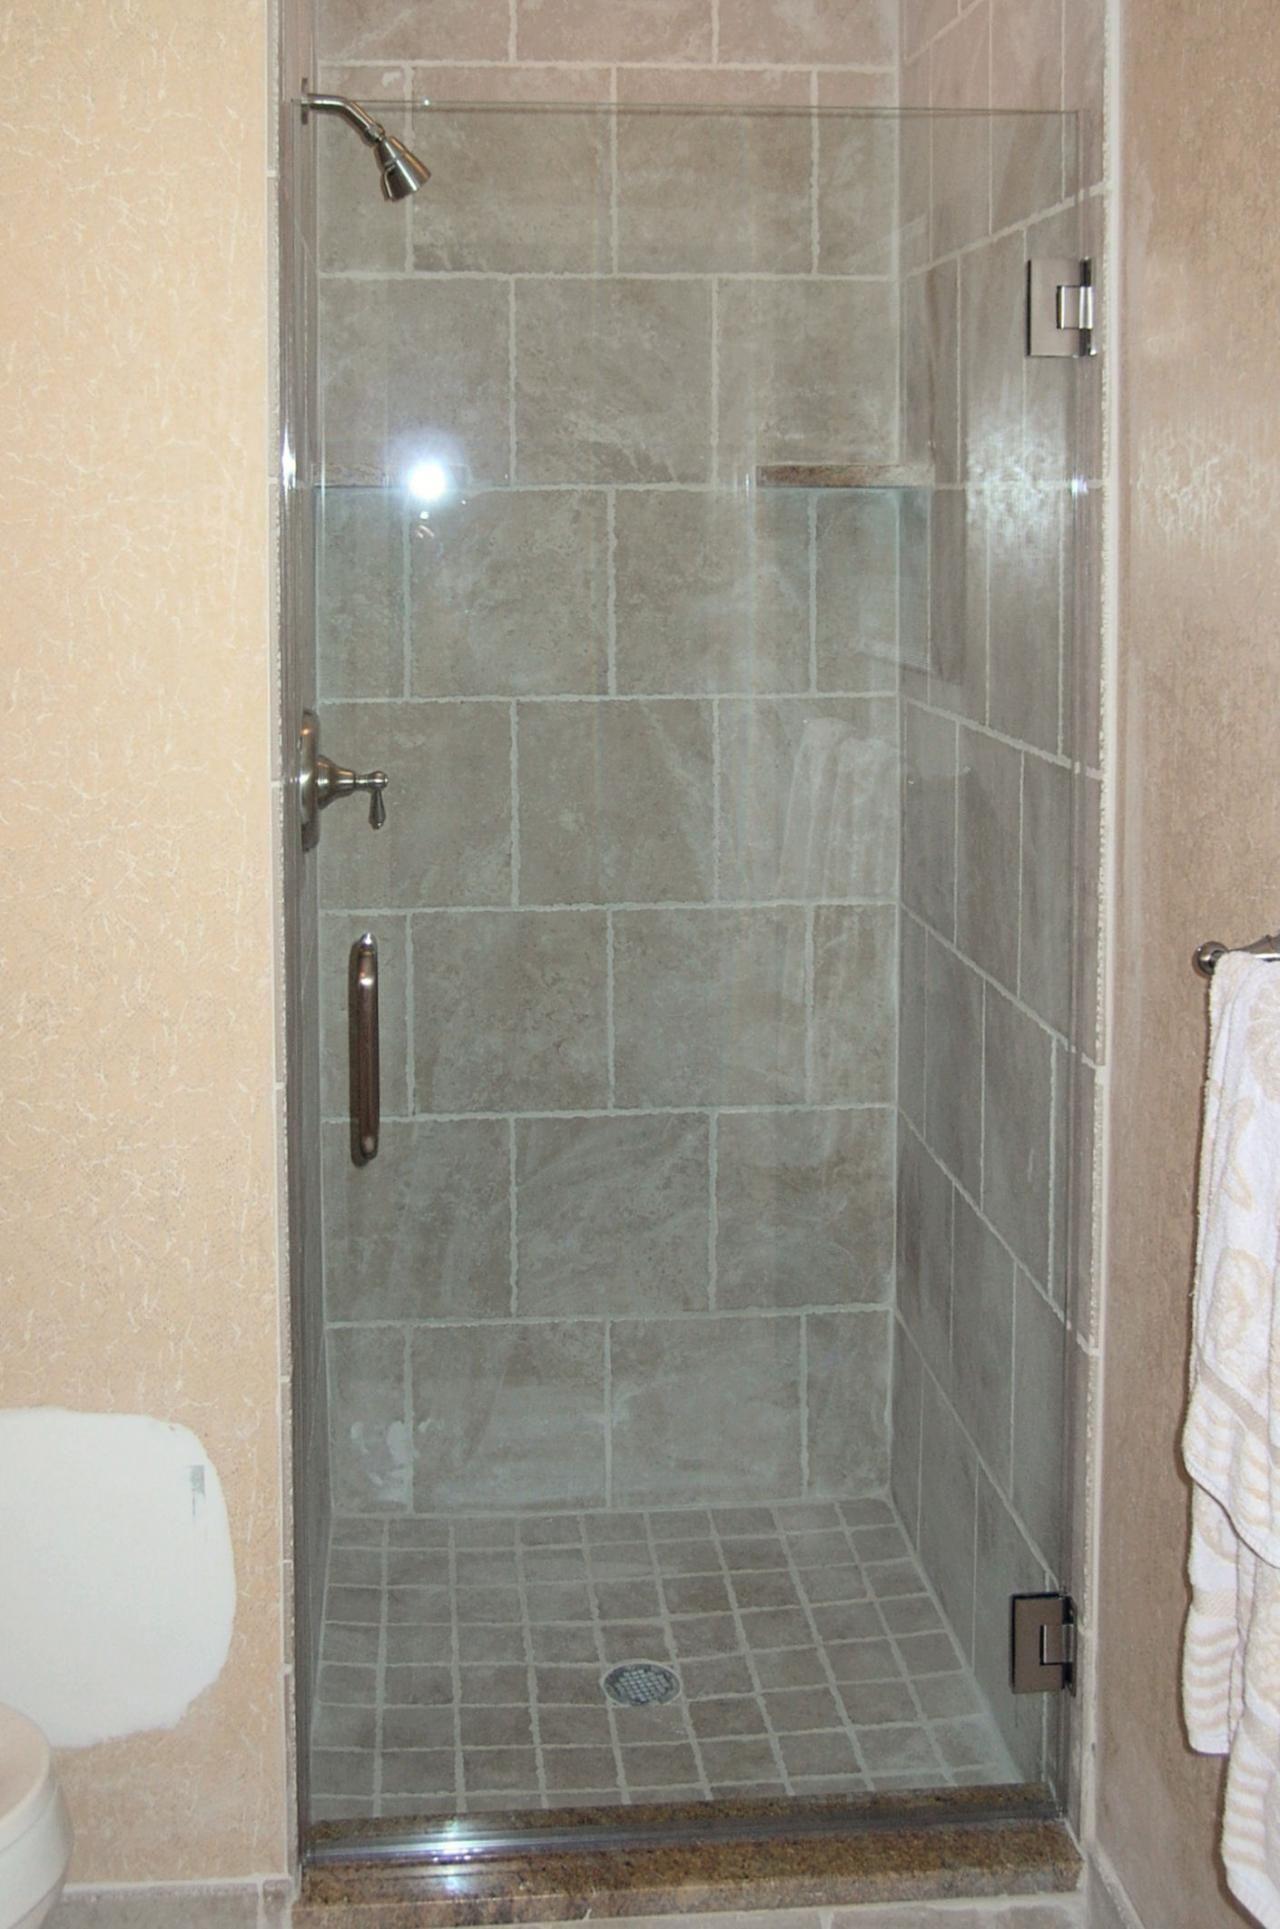 Single Panel Glass Shower Doors Glass Shower Doors Shower